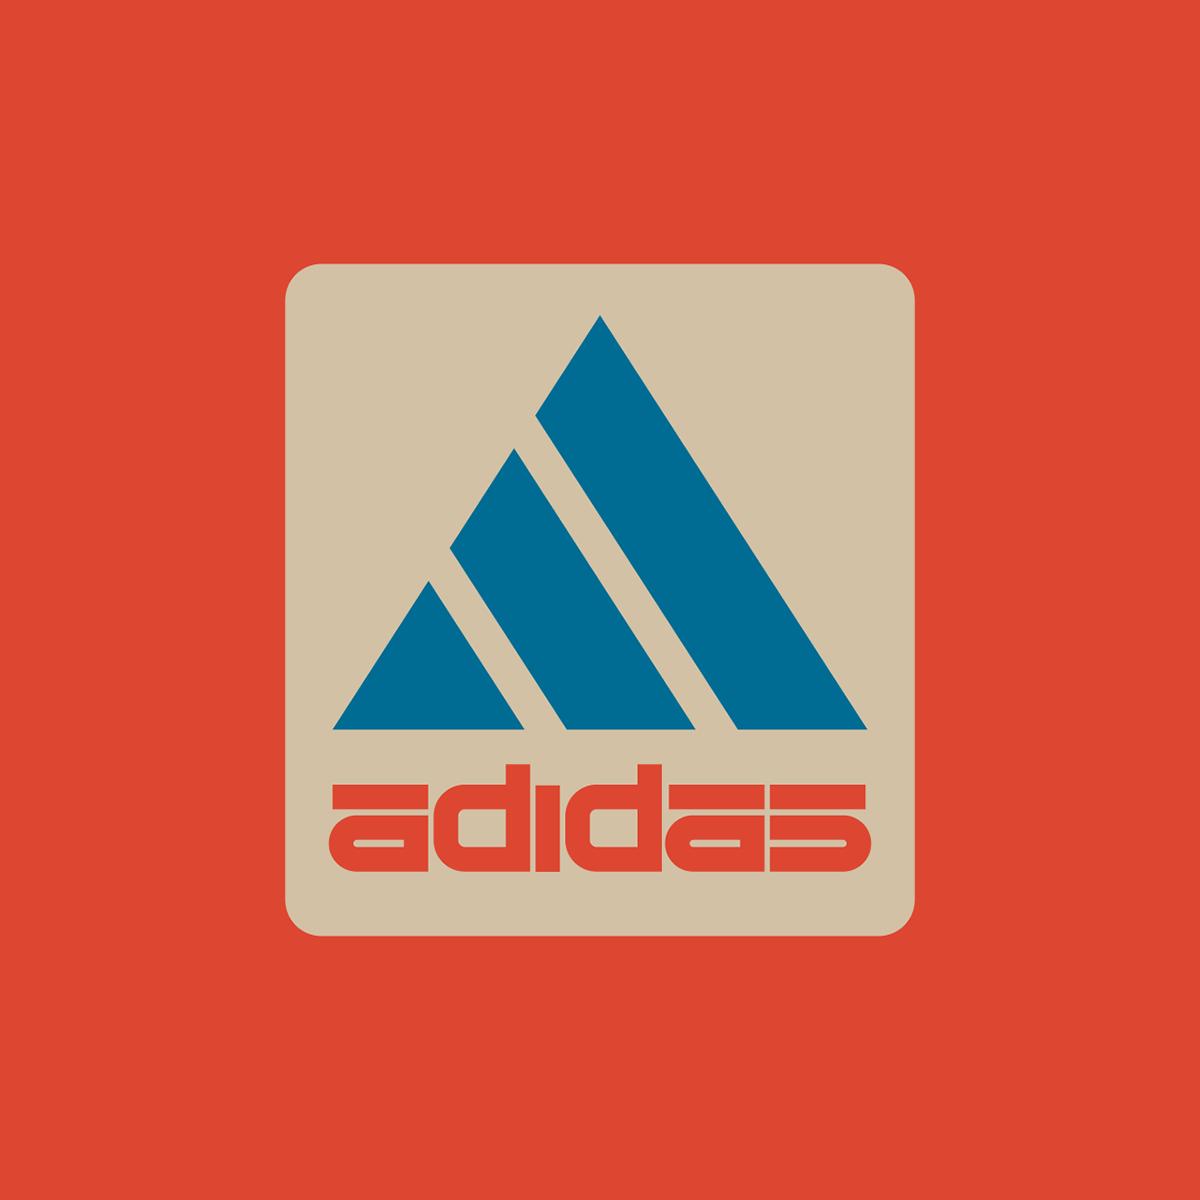 adidas dope ikea Love nyc Paris 2024 paris 2024 olympics playstation spotify windows